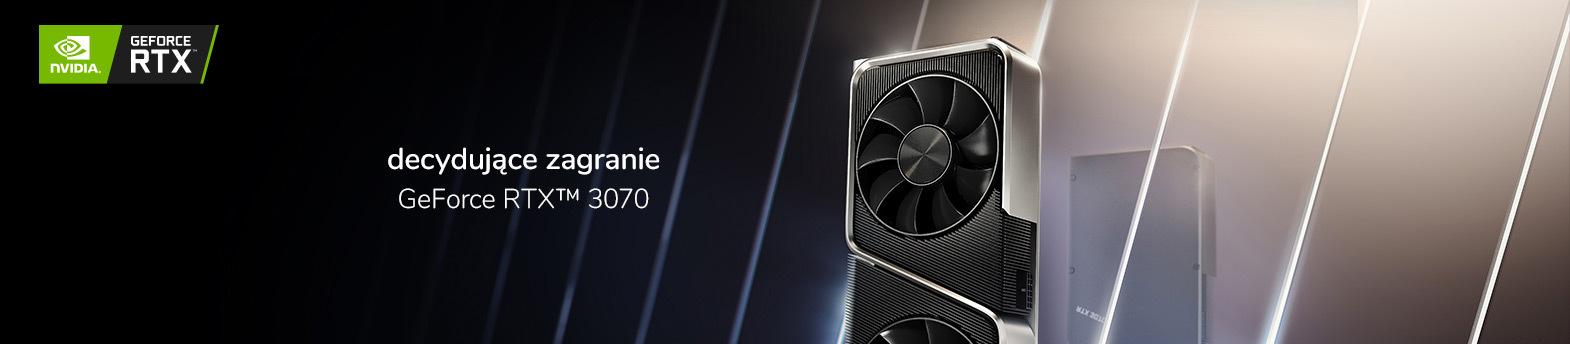 premiera GeForce RTX™ 3070